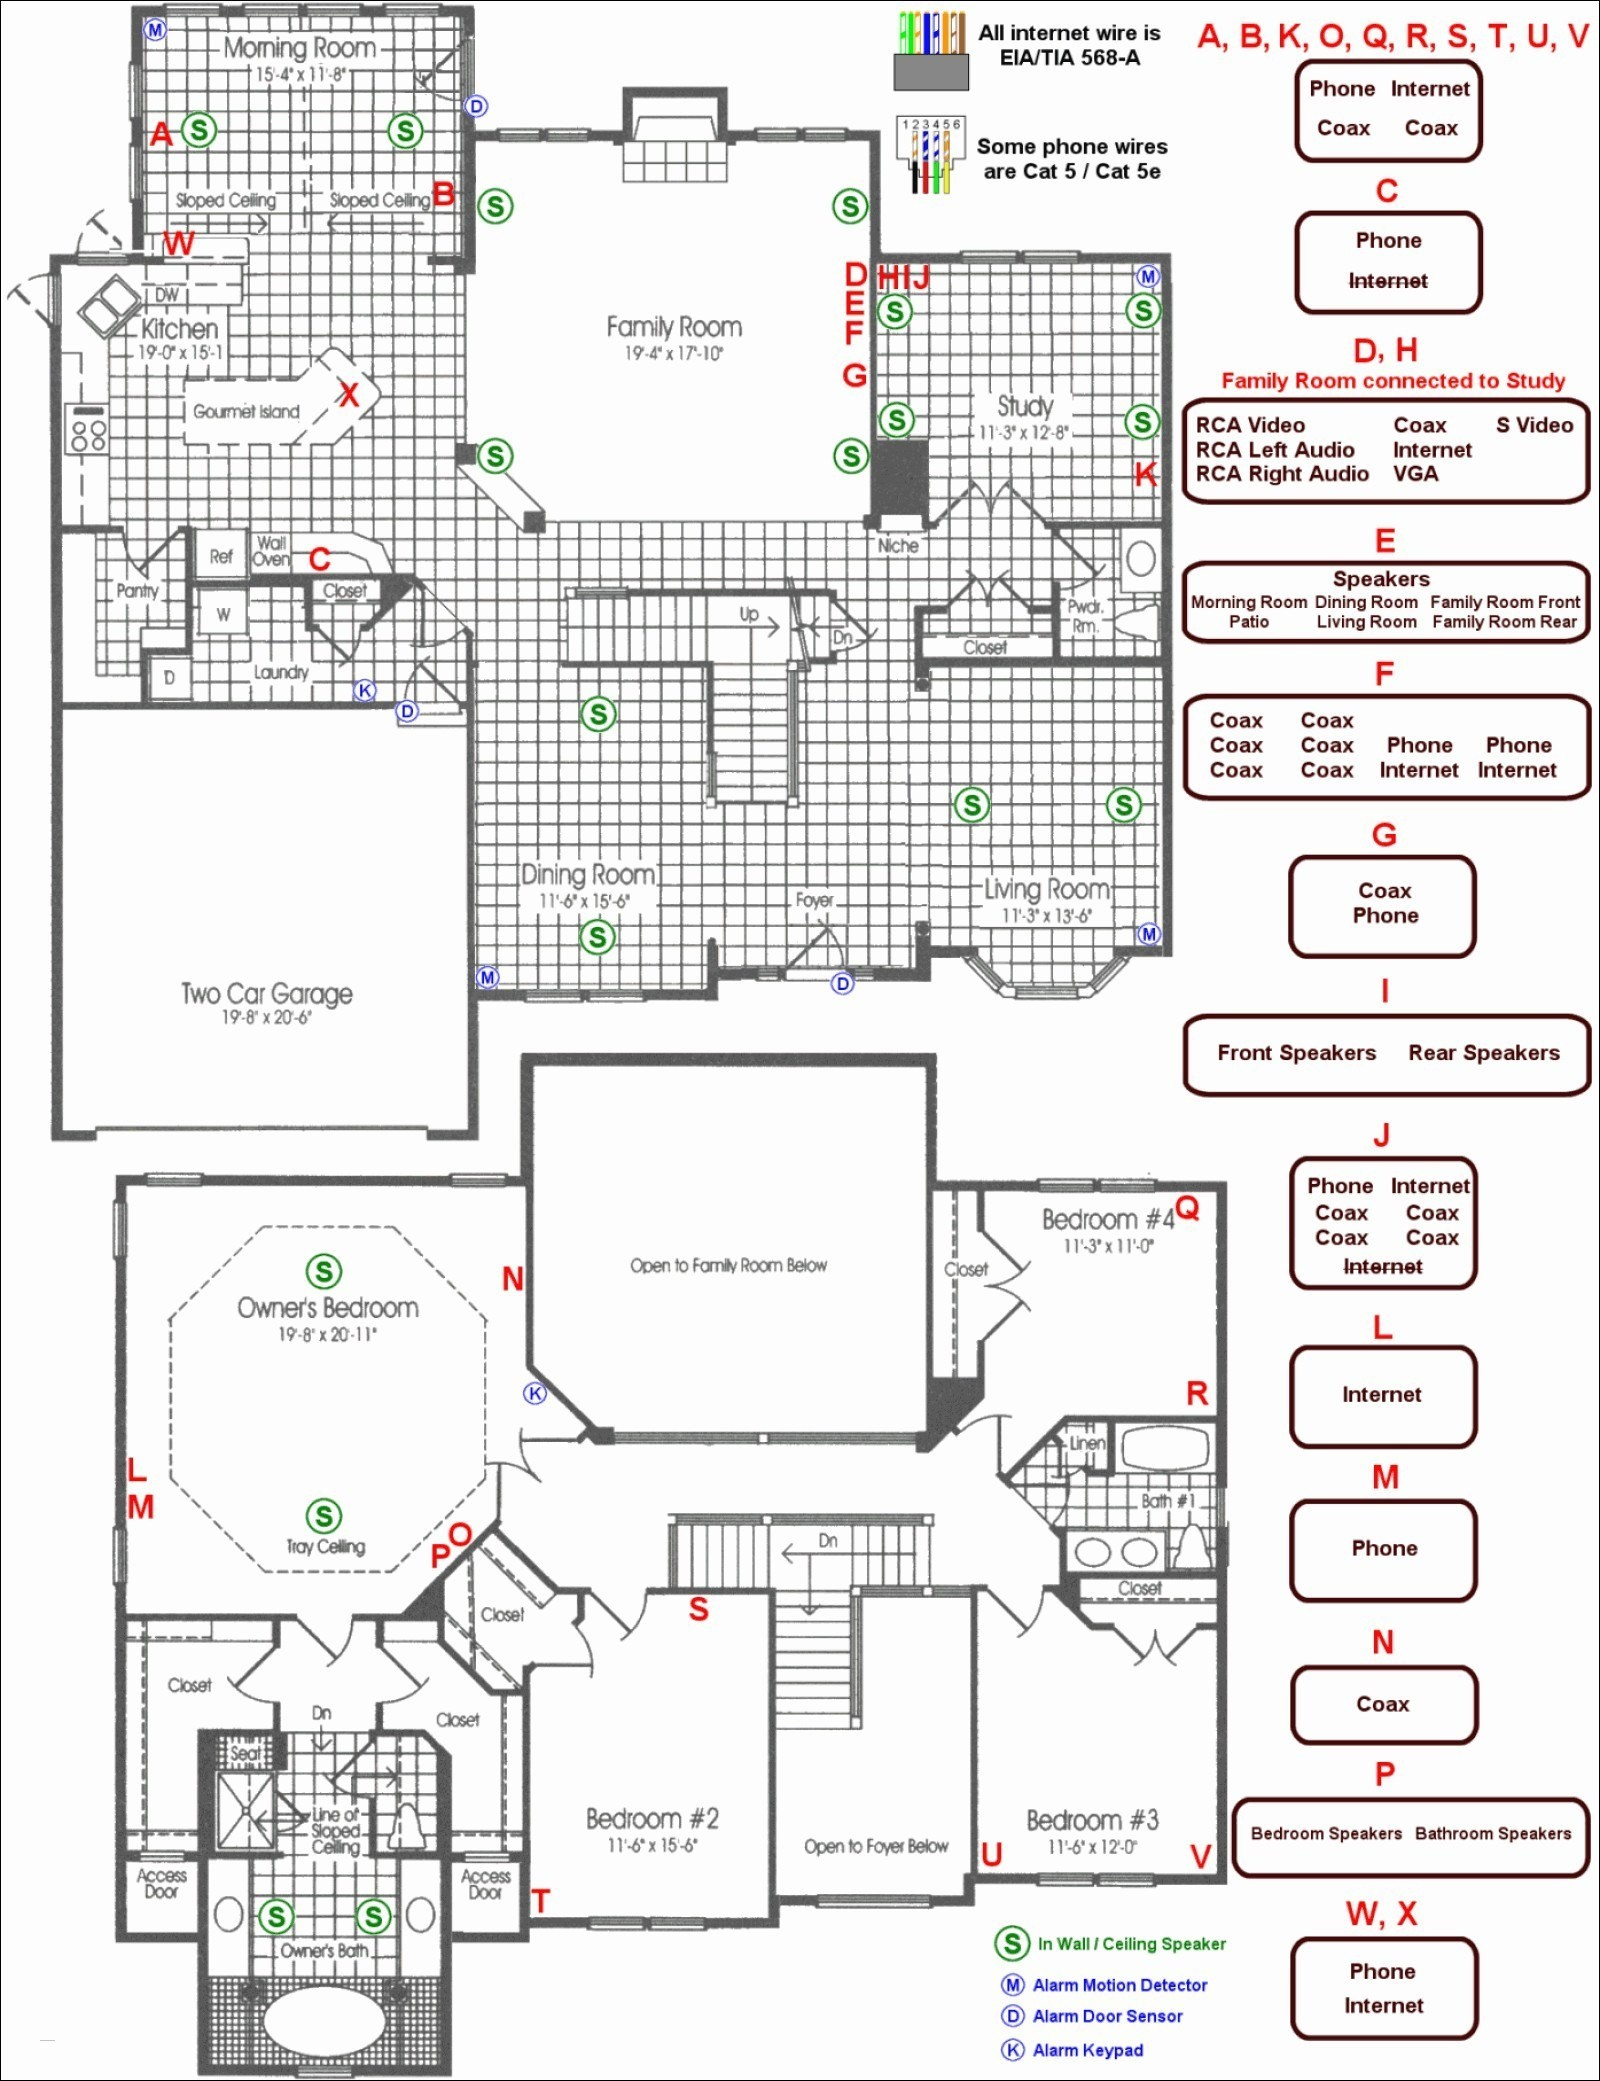 Wiring Diagram for House Lighting Circuit Basic House Wiring Diagram Collection Of Wiring Diagram for House Lighting Circuit